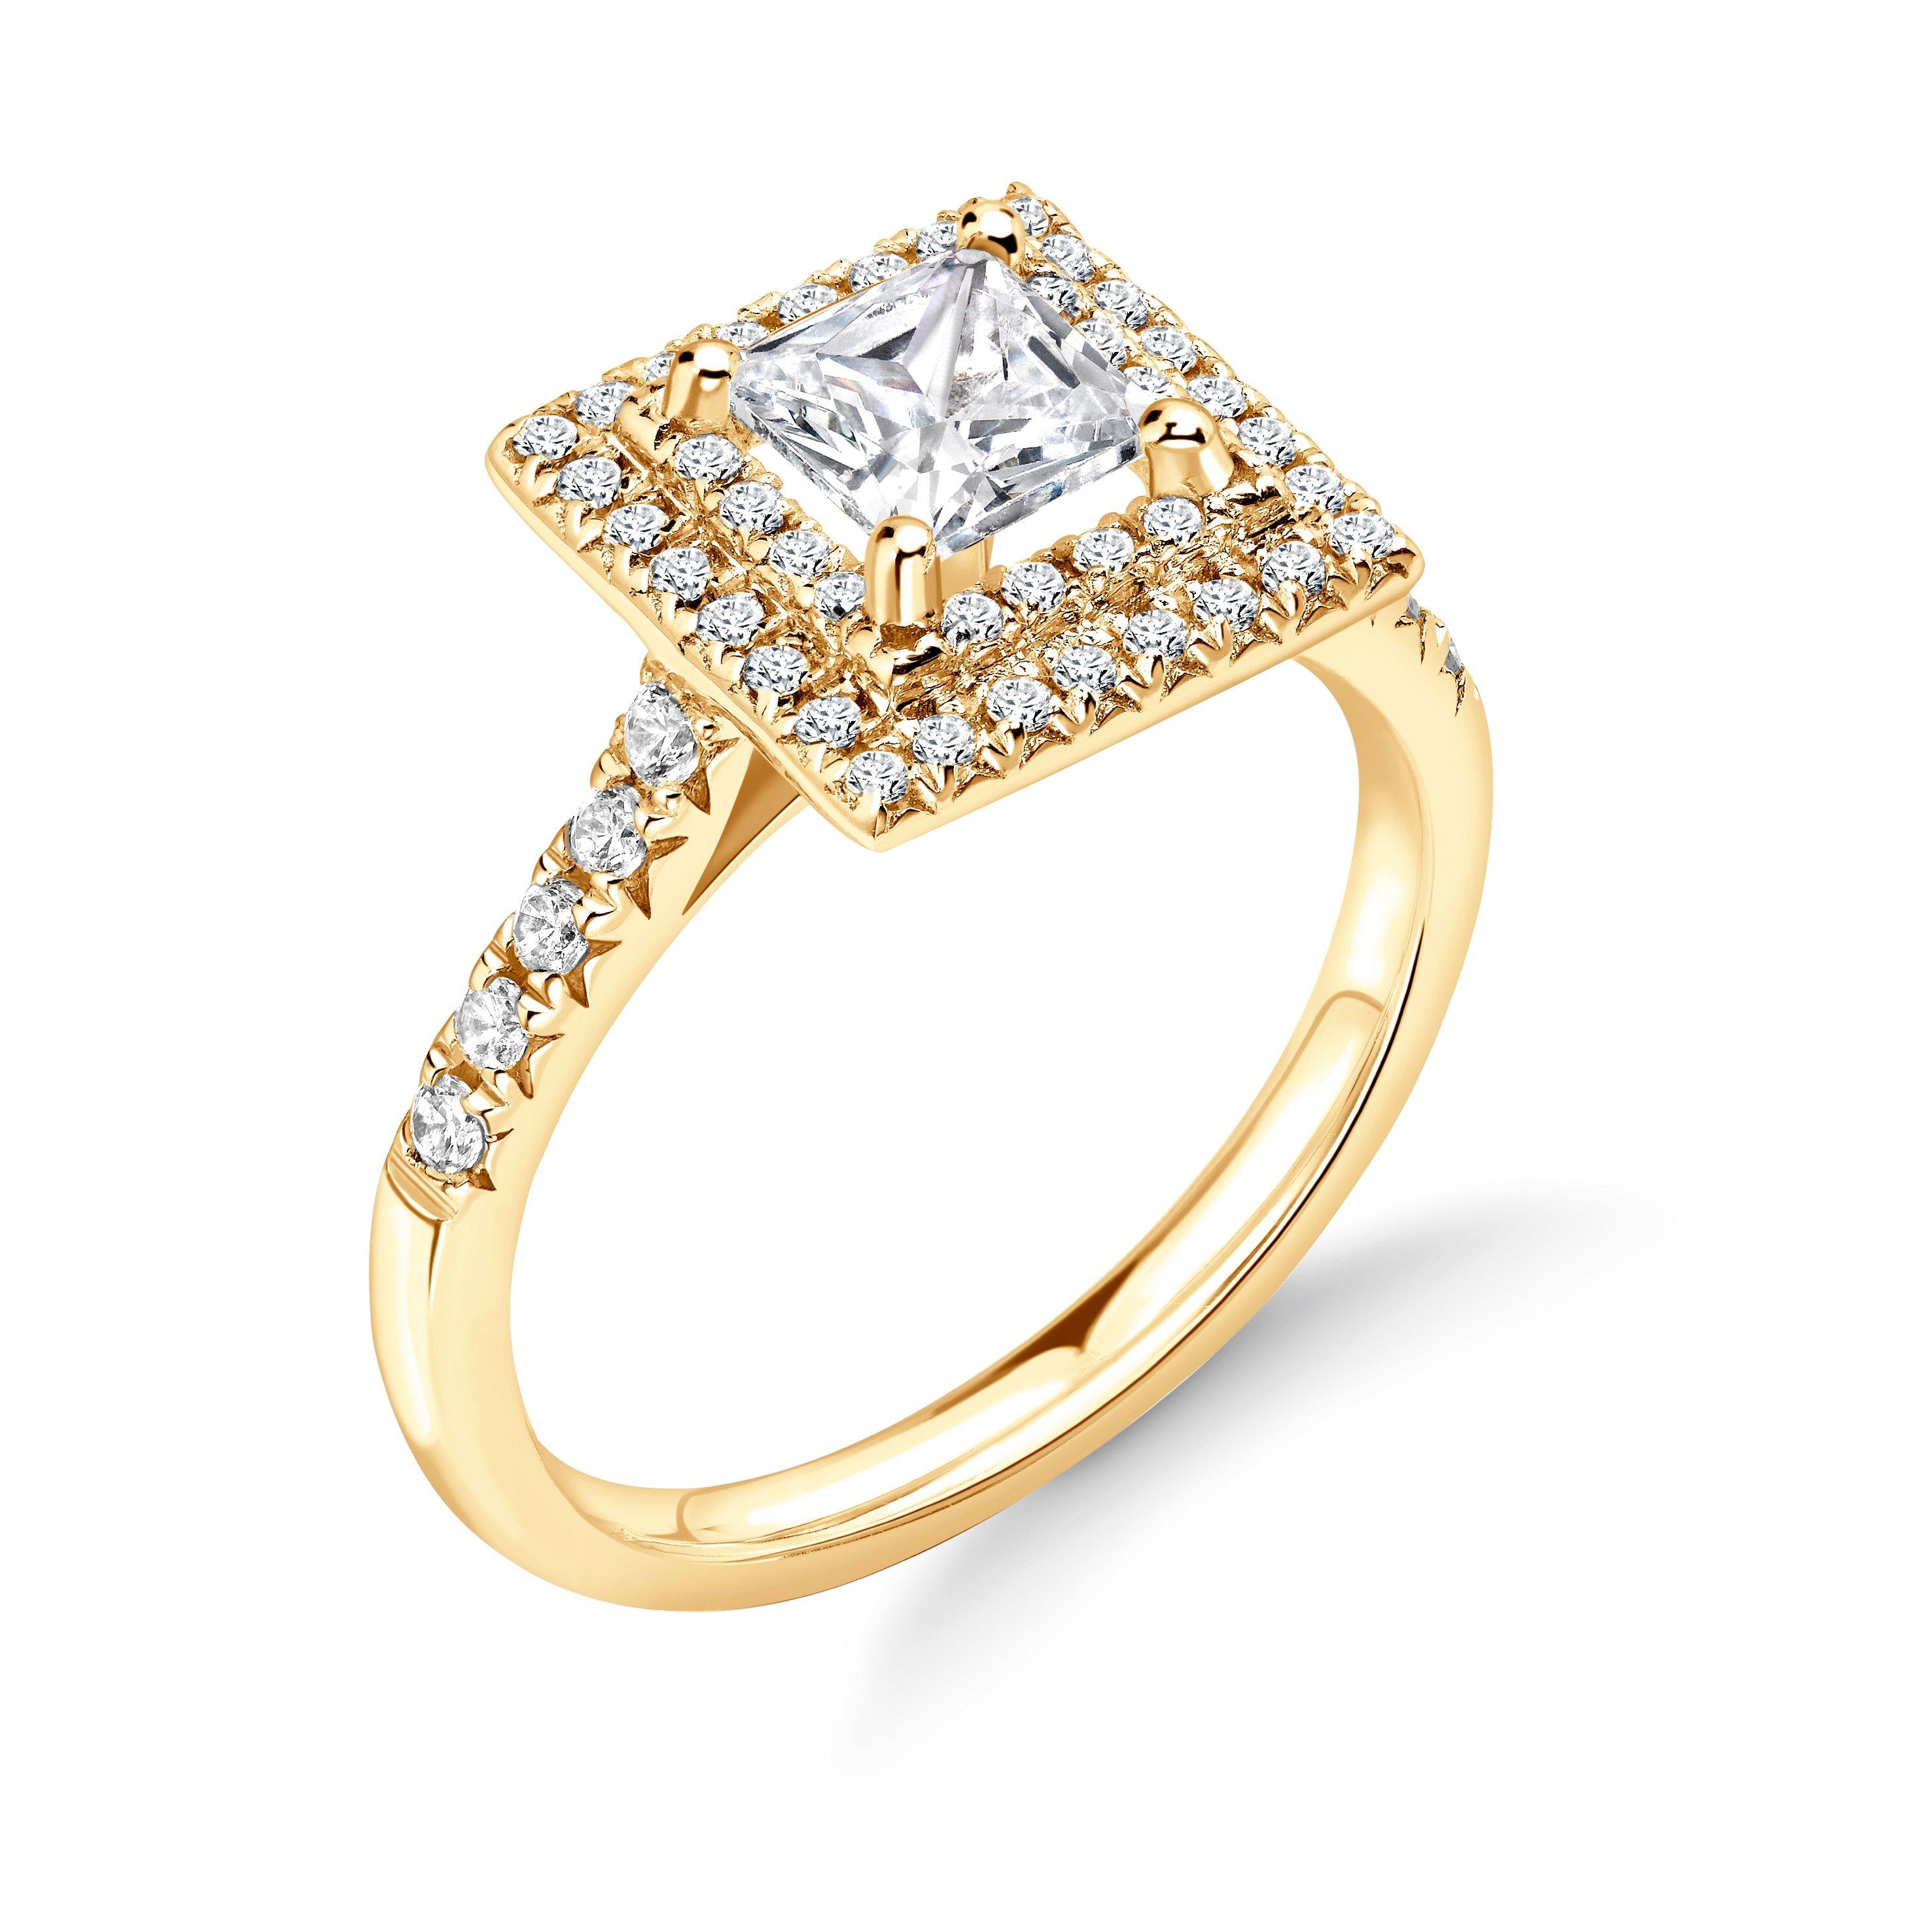 4 Prong Setting Princess Shape 2 Raw Halo Diamond Engagement Rings